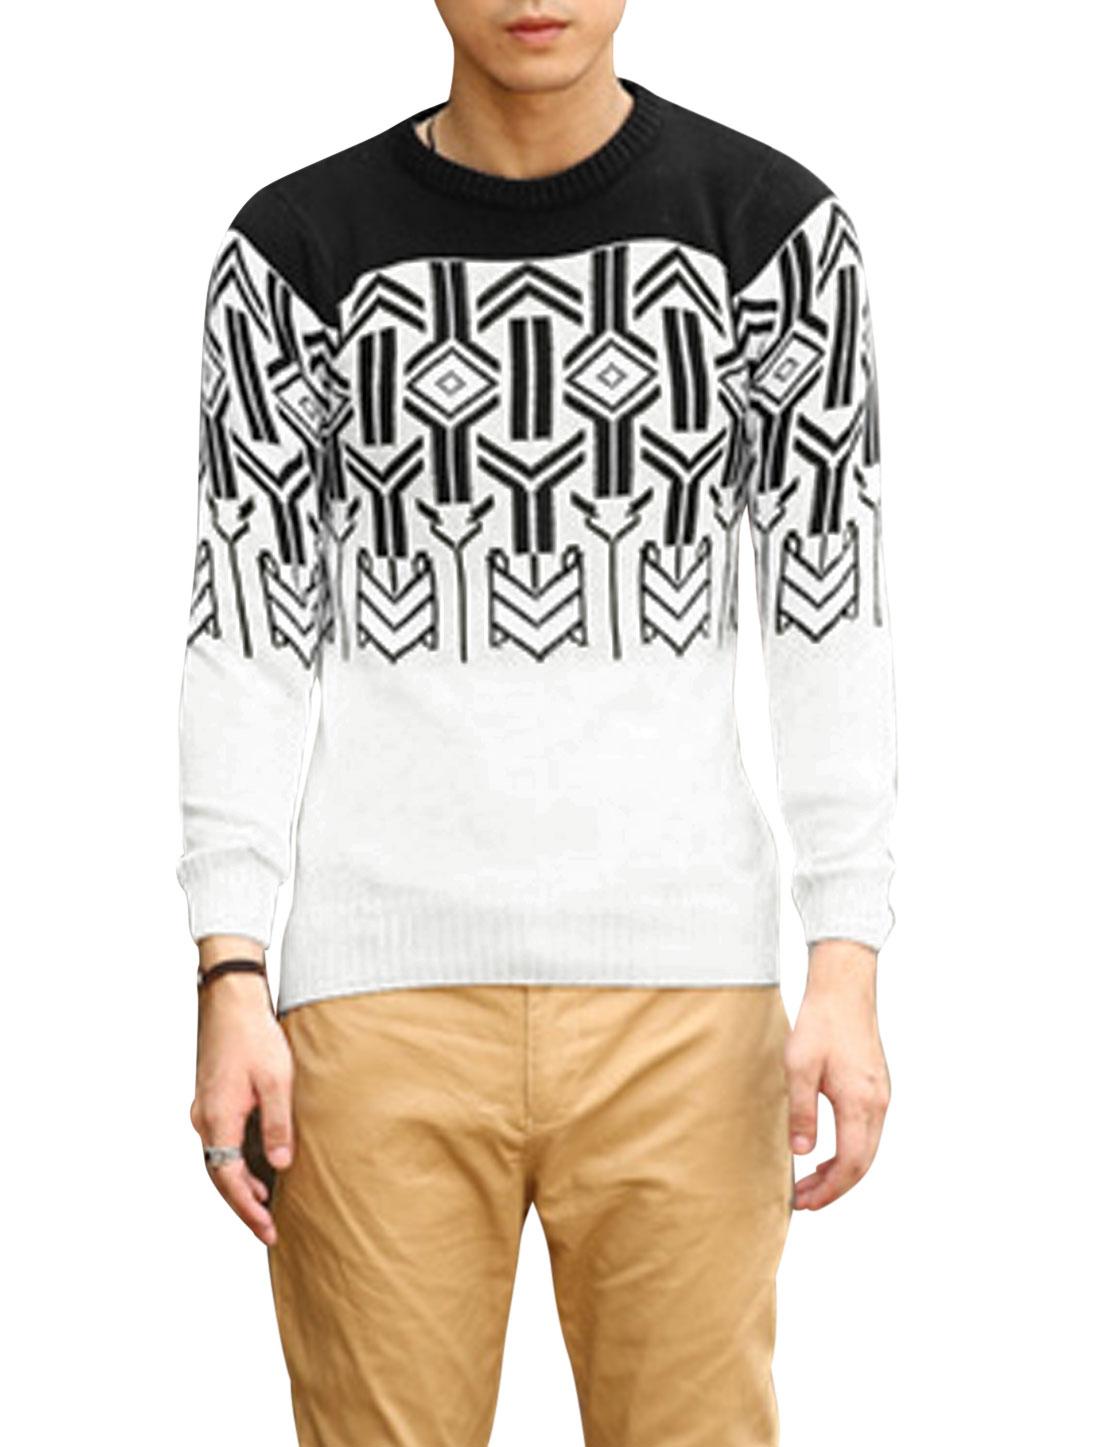 Men Pullover Geometric Zig-Zag Pattern Ribbed Hem Sweater Black White S